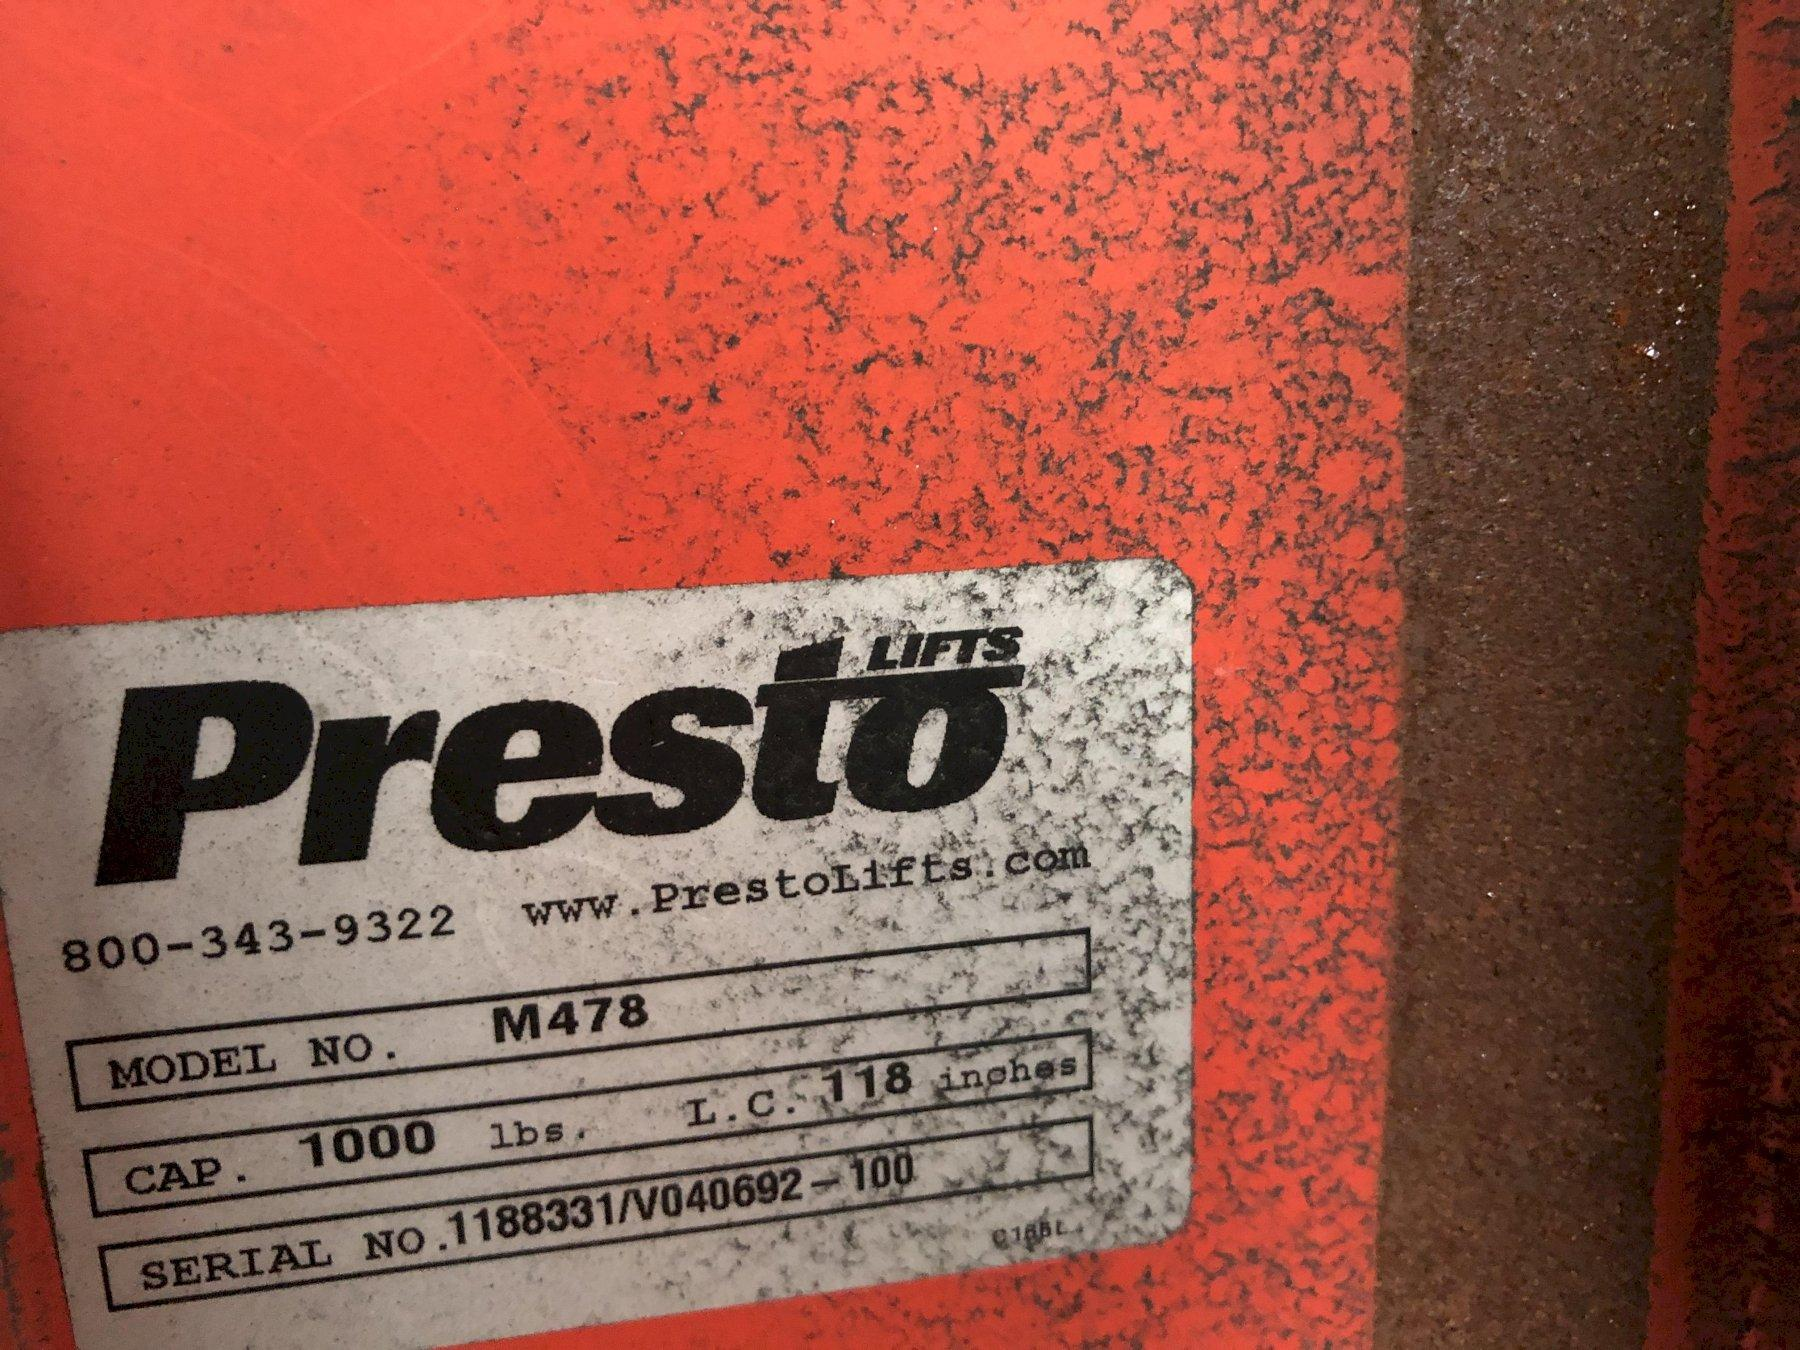 PRESTO HAND LIFT CART MODEL M478 S/N 1188331/V040692-100, 1000# CAPACITY